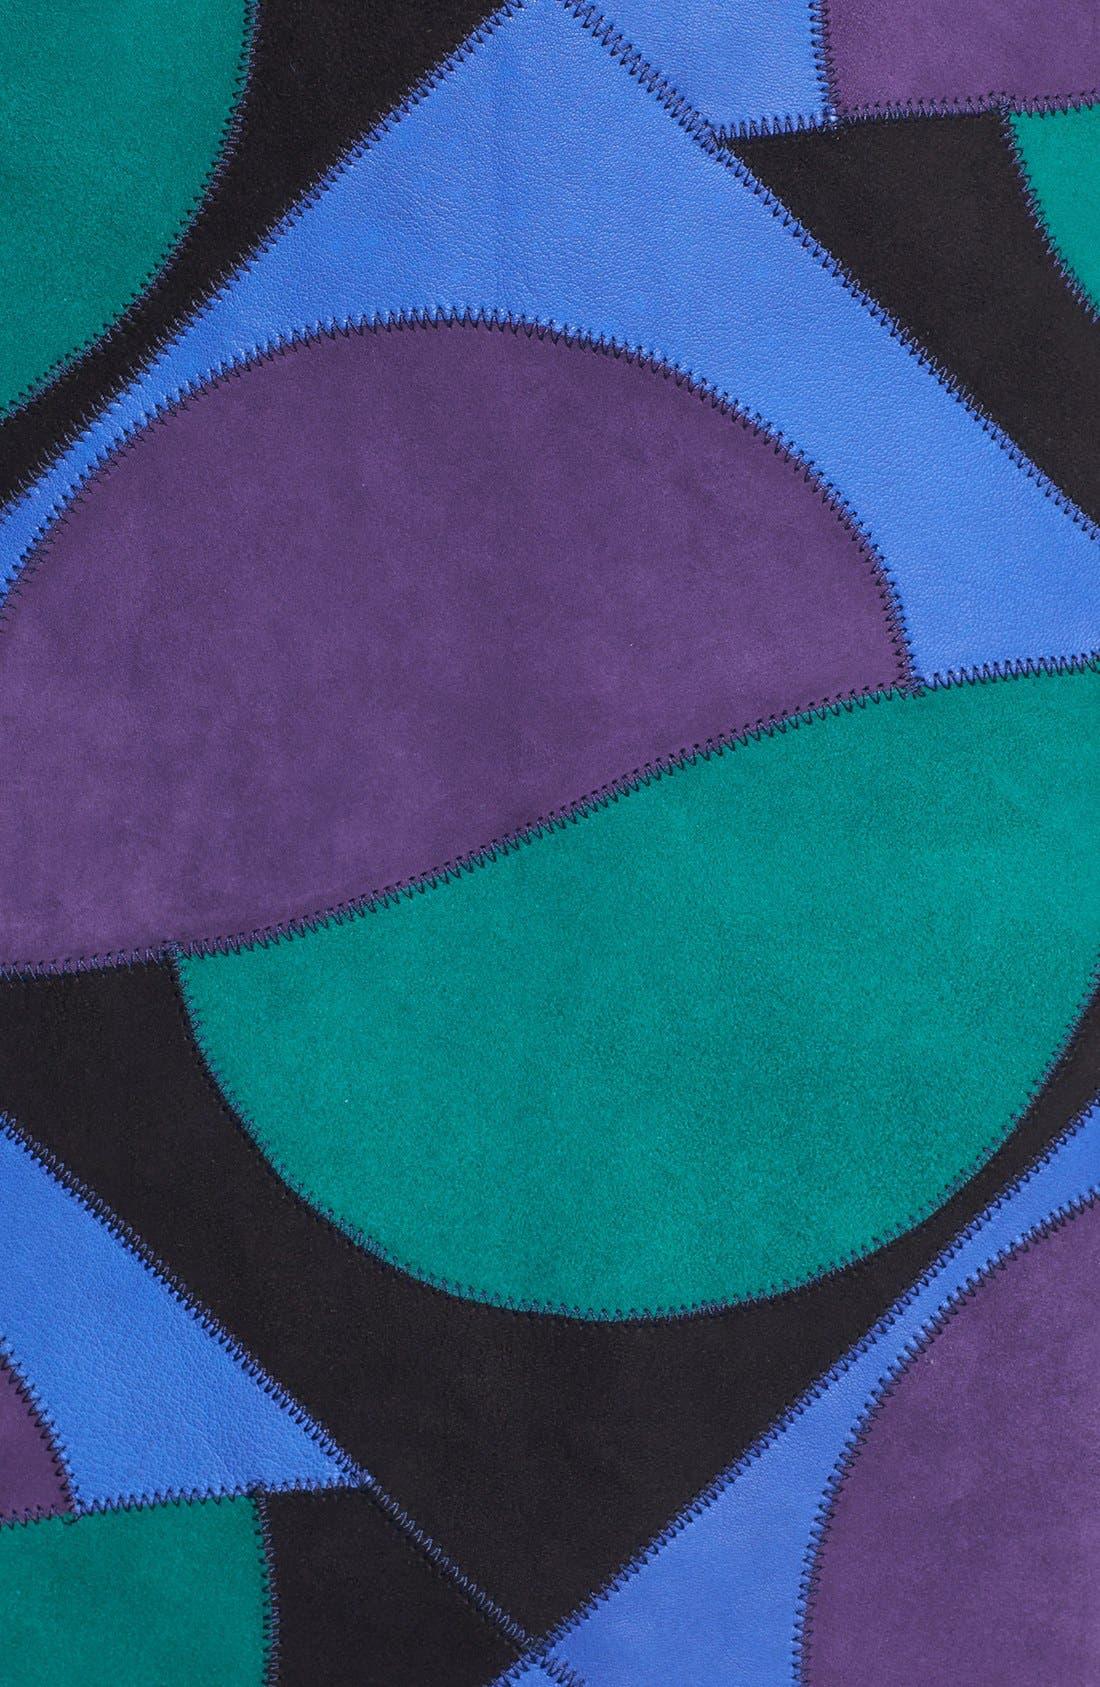 Alternate Image 3  - MARC BY MARC JACOBS 'Luna Patchwork' Suede Skirt